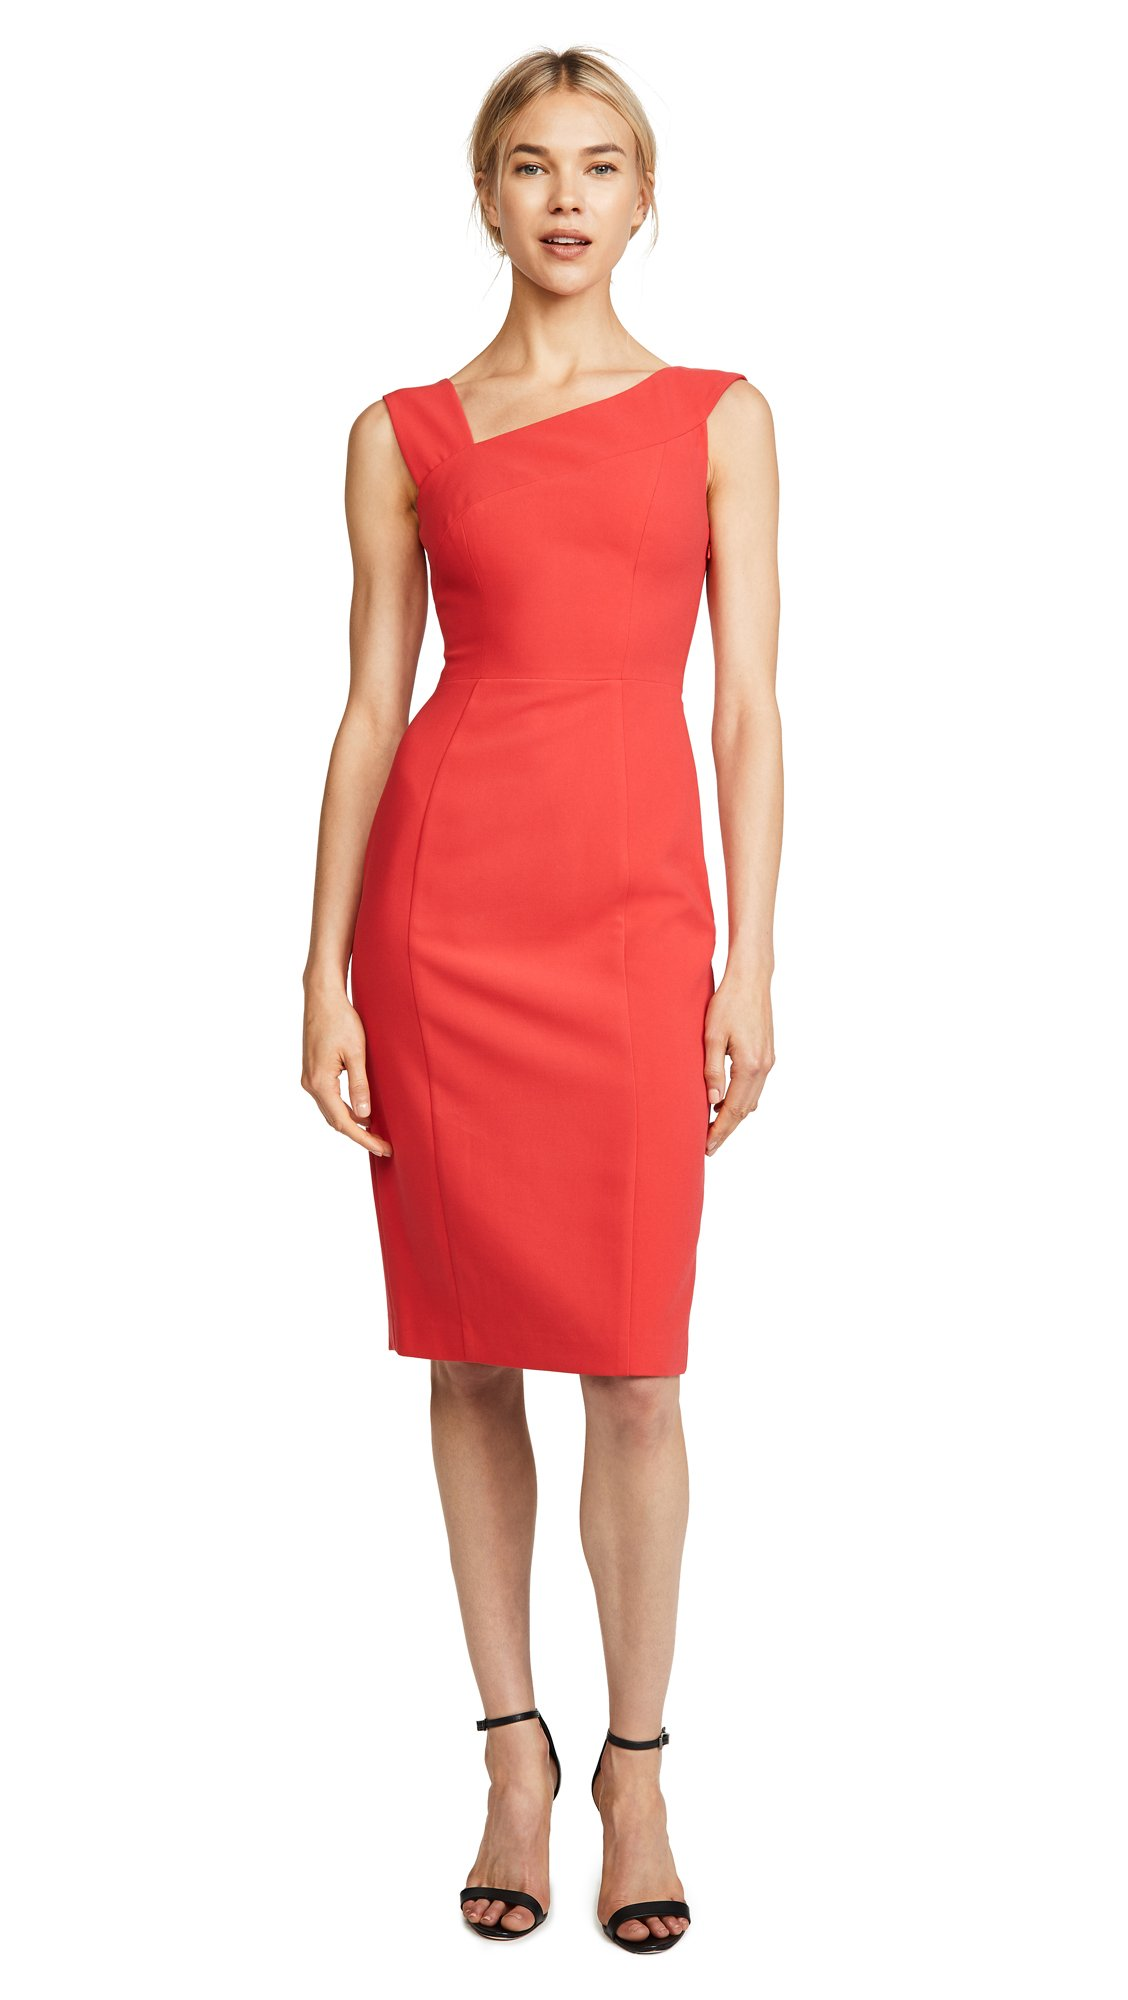 Available at Amazon: Black Halo Women's Maven Sheath Dress